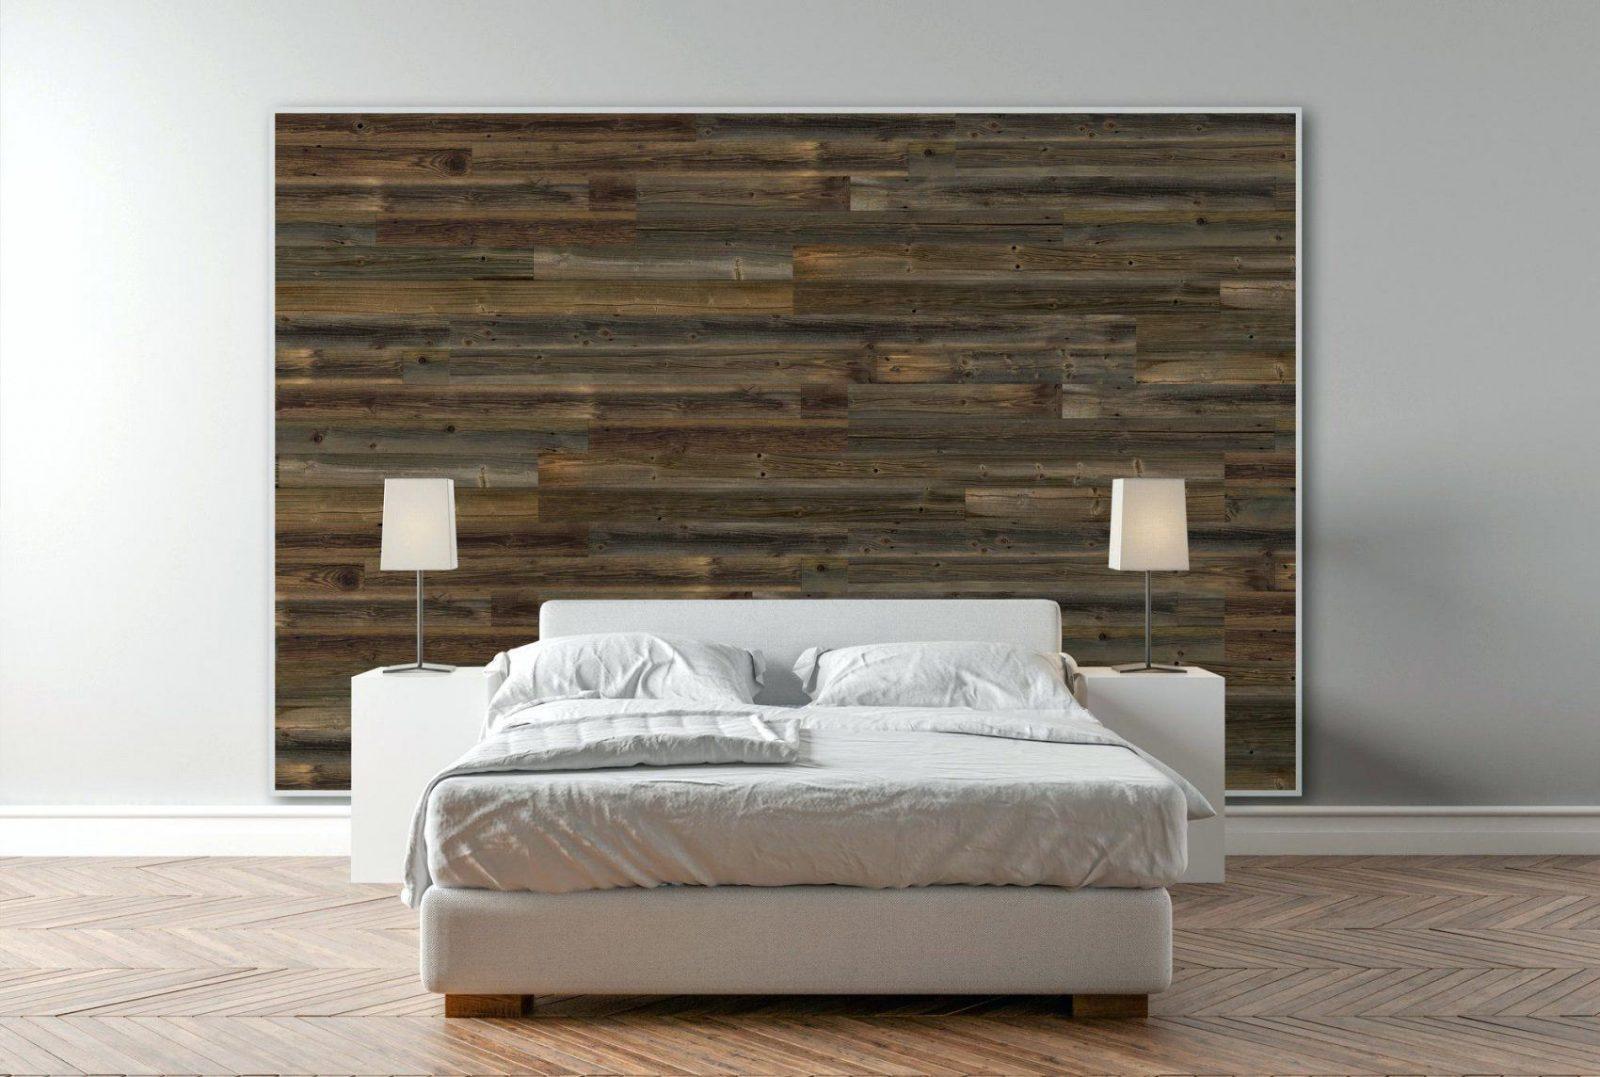 Wandverkleidung Holz Altholz Wandverkleidung Sonnenverbrannt von Wandverkleidung Holz Innen Anleitung Photo